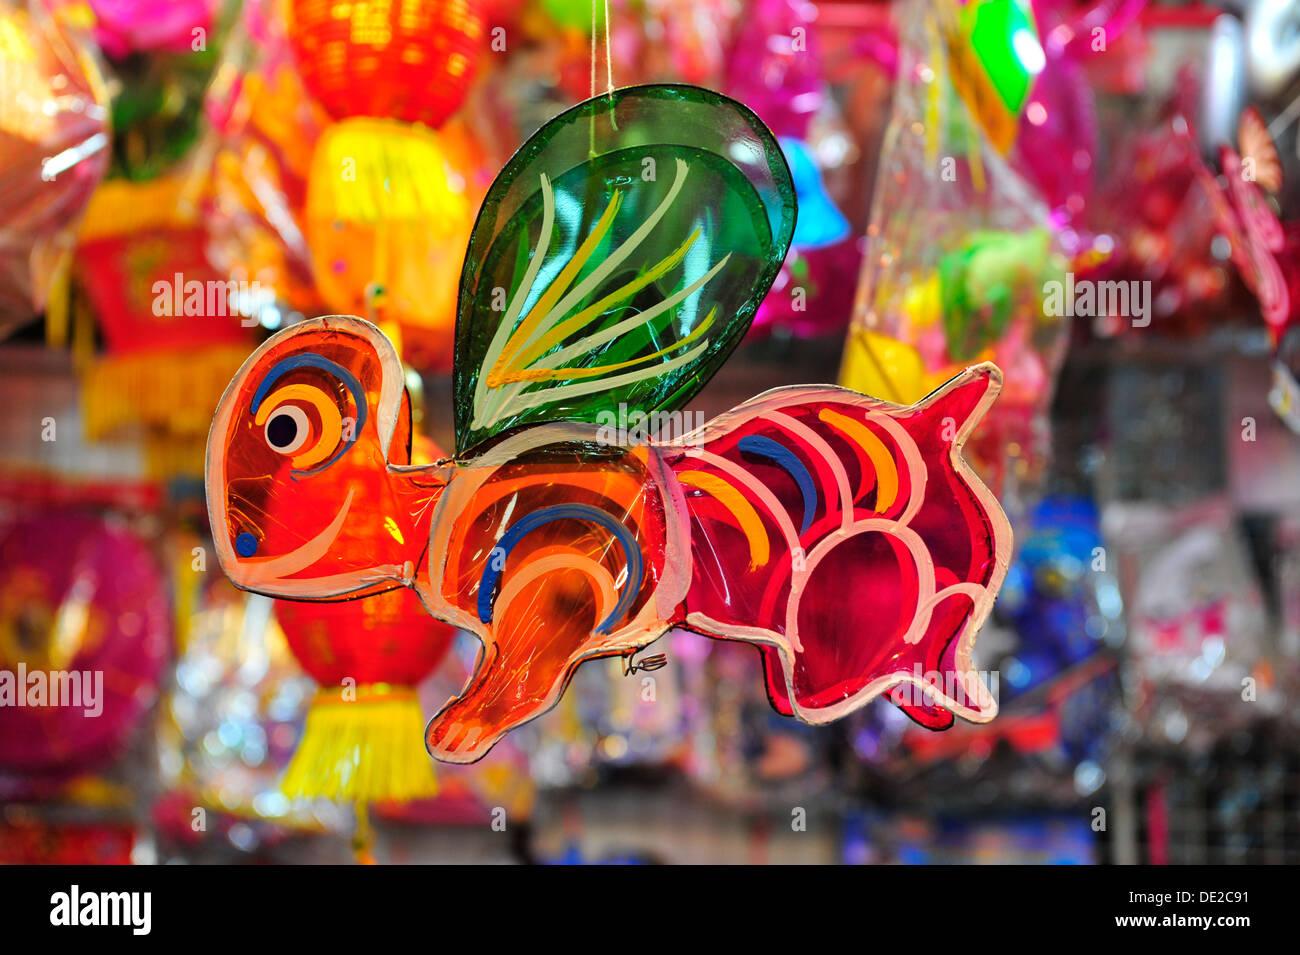 1d97548dd Singapore Chinatown Mid-Autumn Festival - Chinese handmade lantern ...